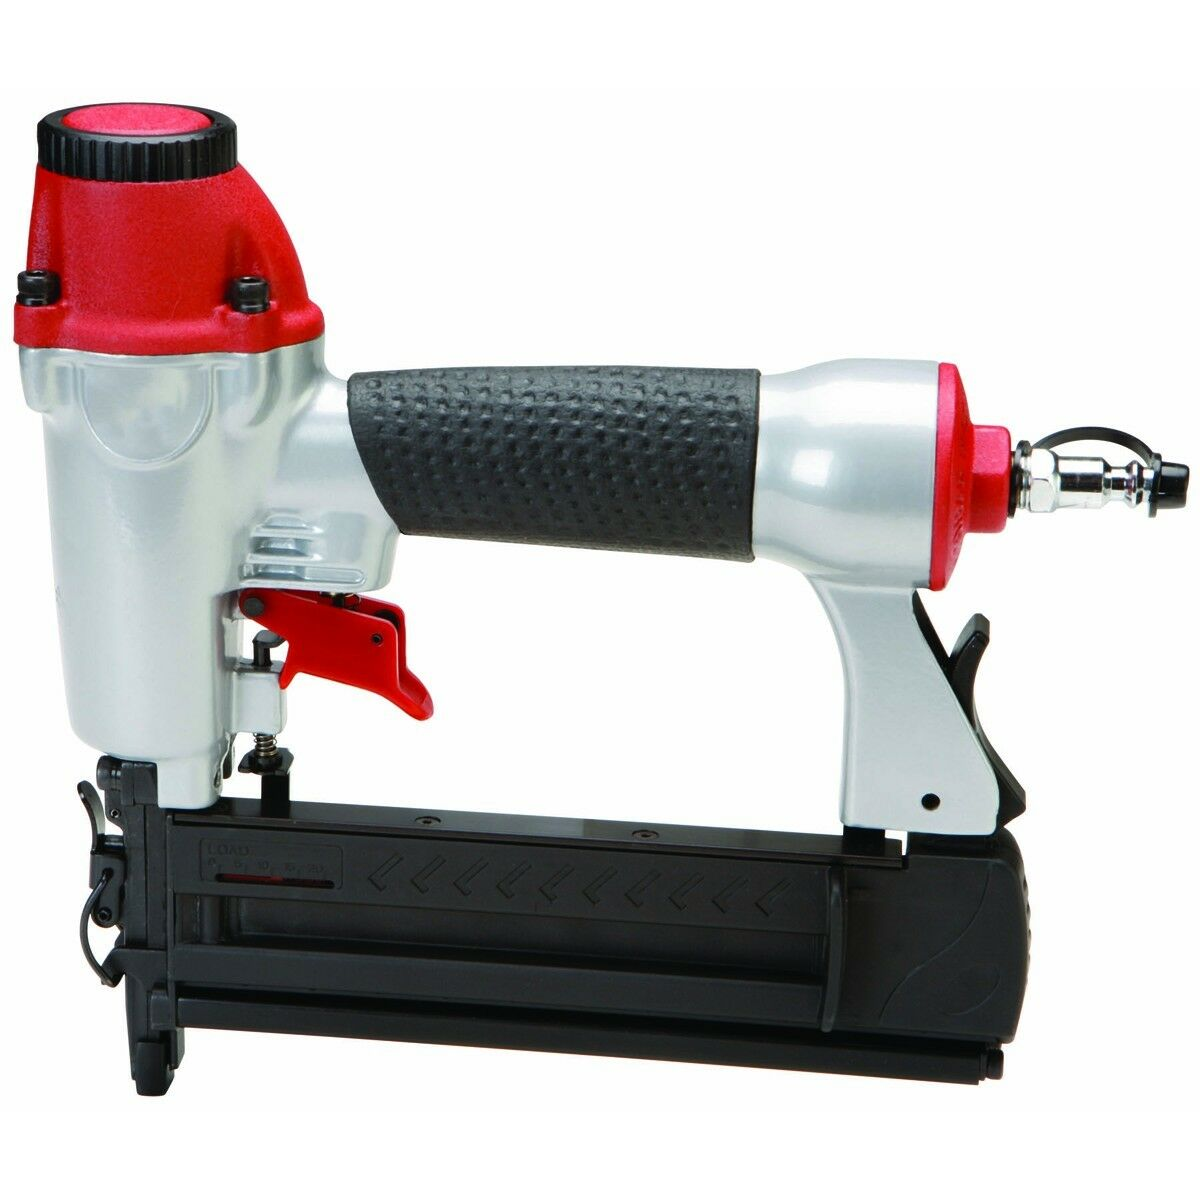 18 Gauge 2-in-1 Air Nailer Stapler Install brad nails or staples